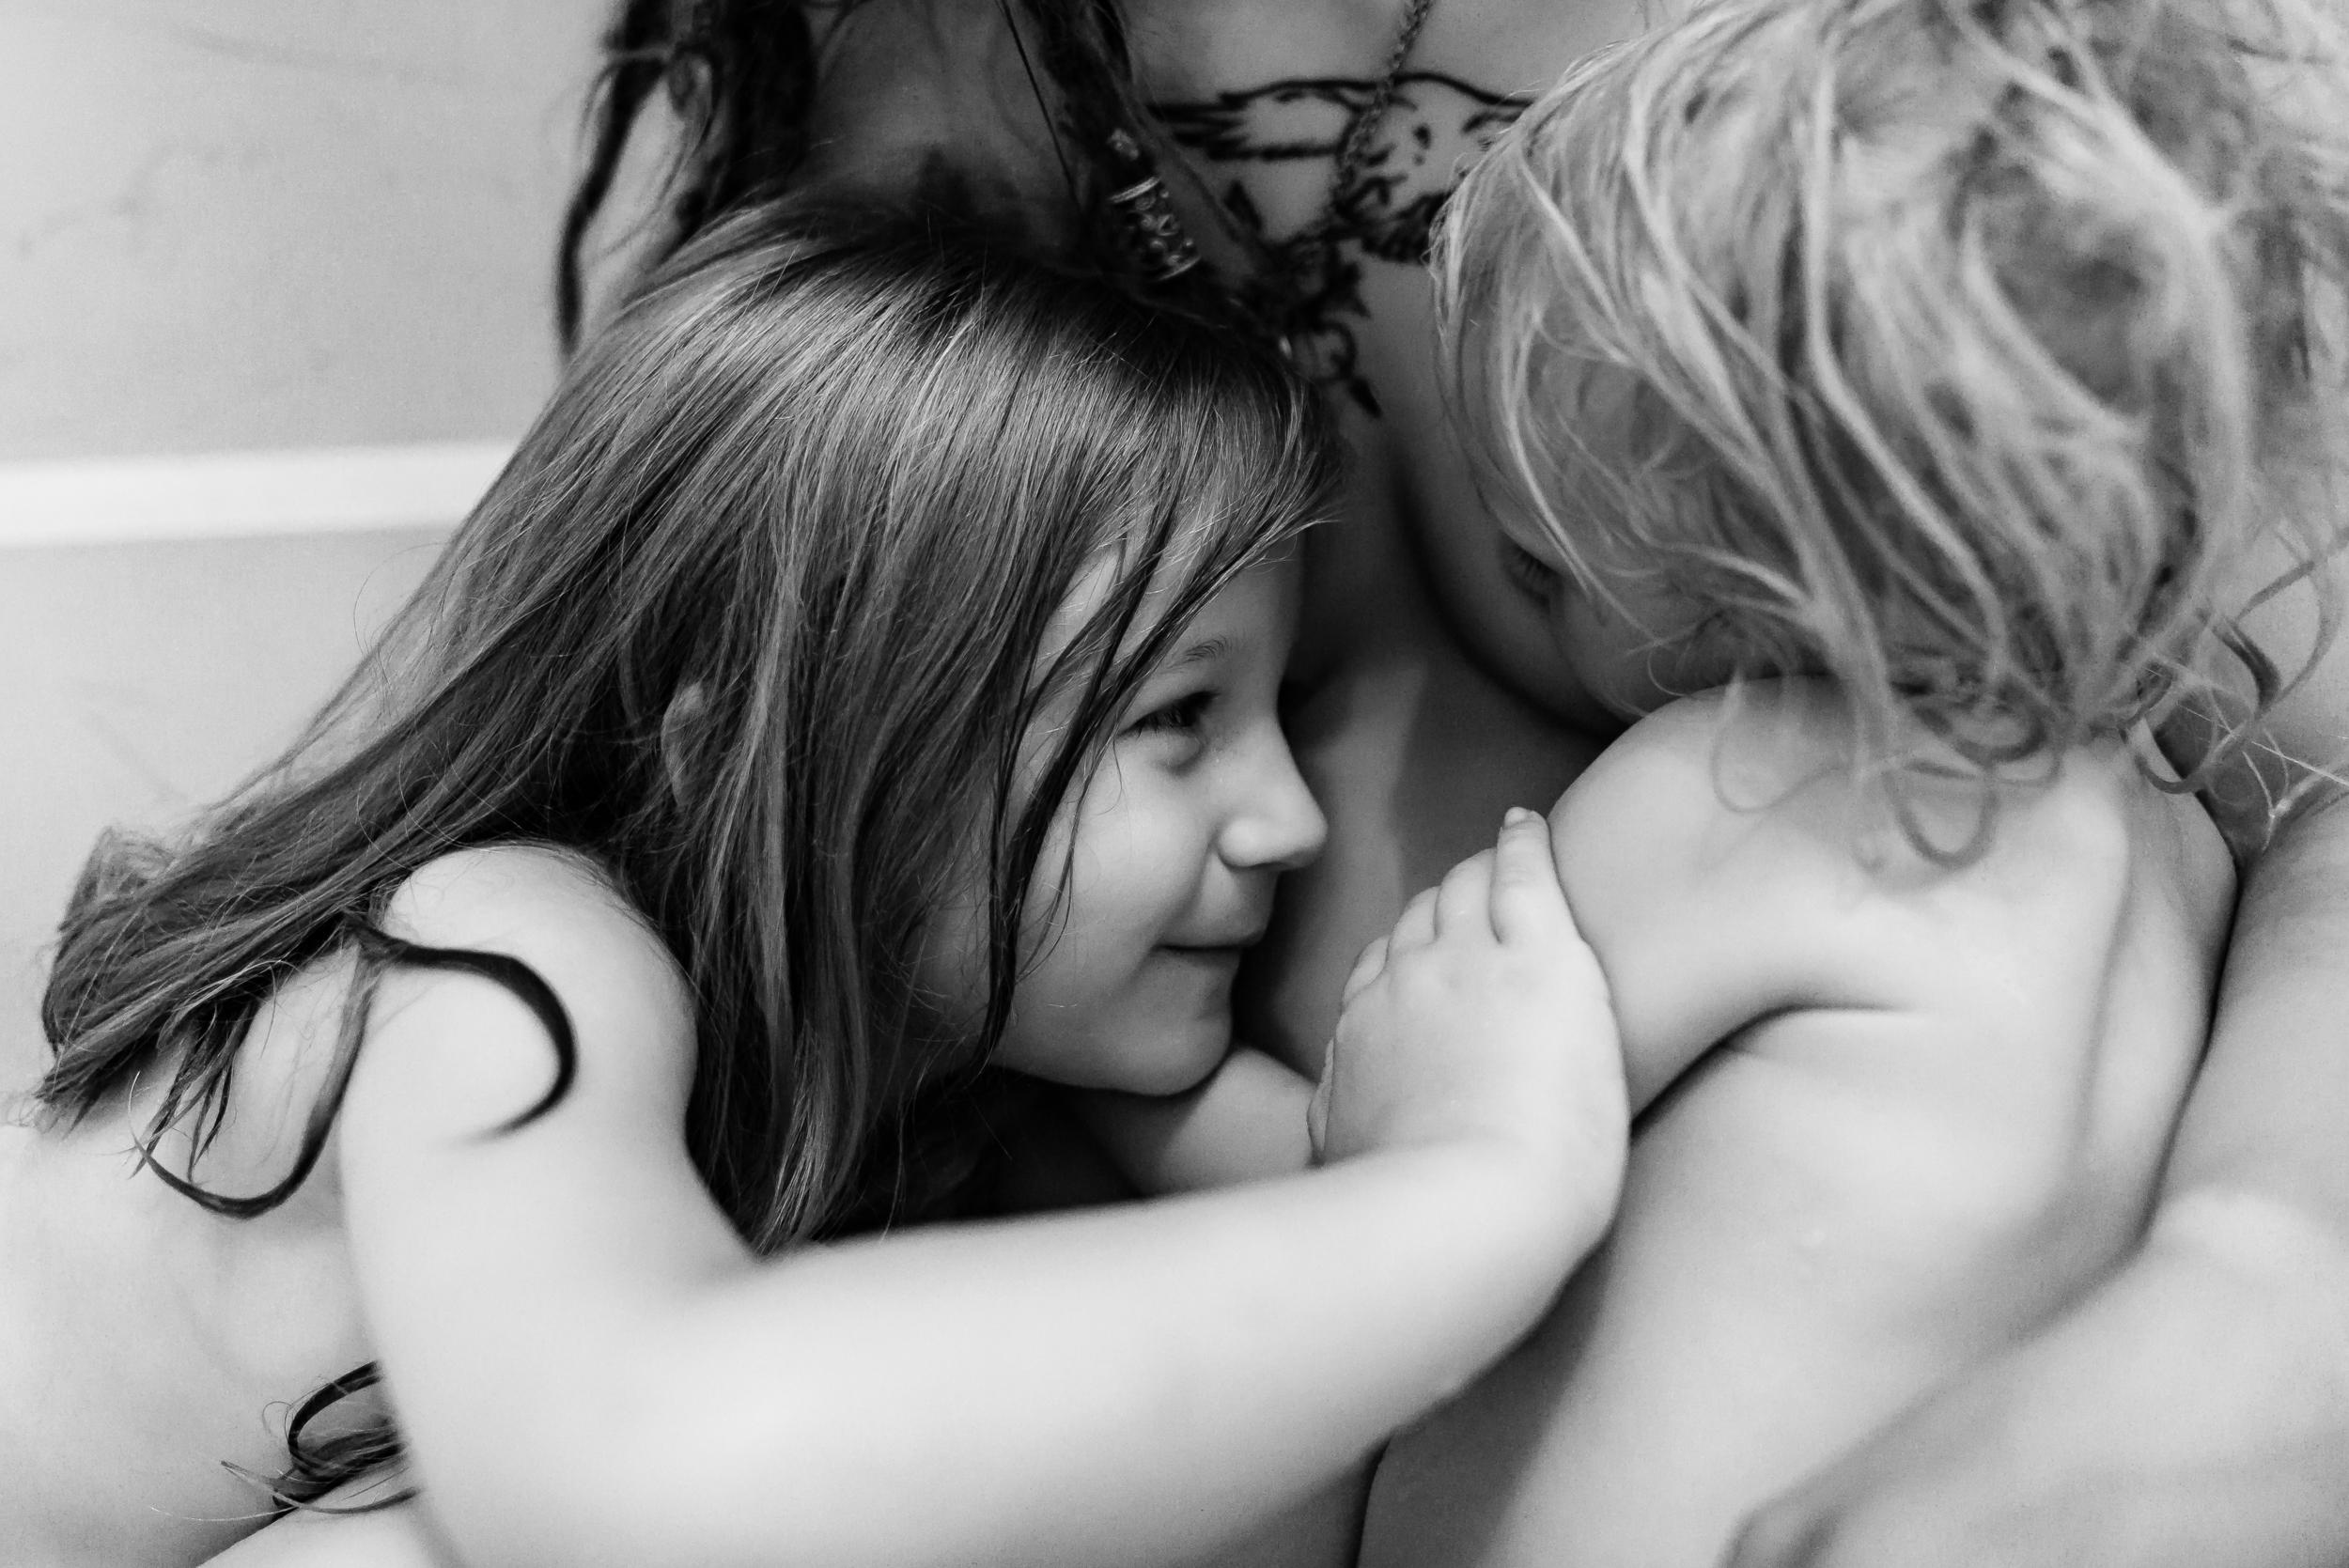 Best Birth Photography Minneapolis St. Paul Minnesota Meredith Westin Postpartum Breastfeeding Motherhood-September 18, 2018-104511.jpg